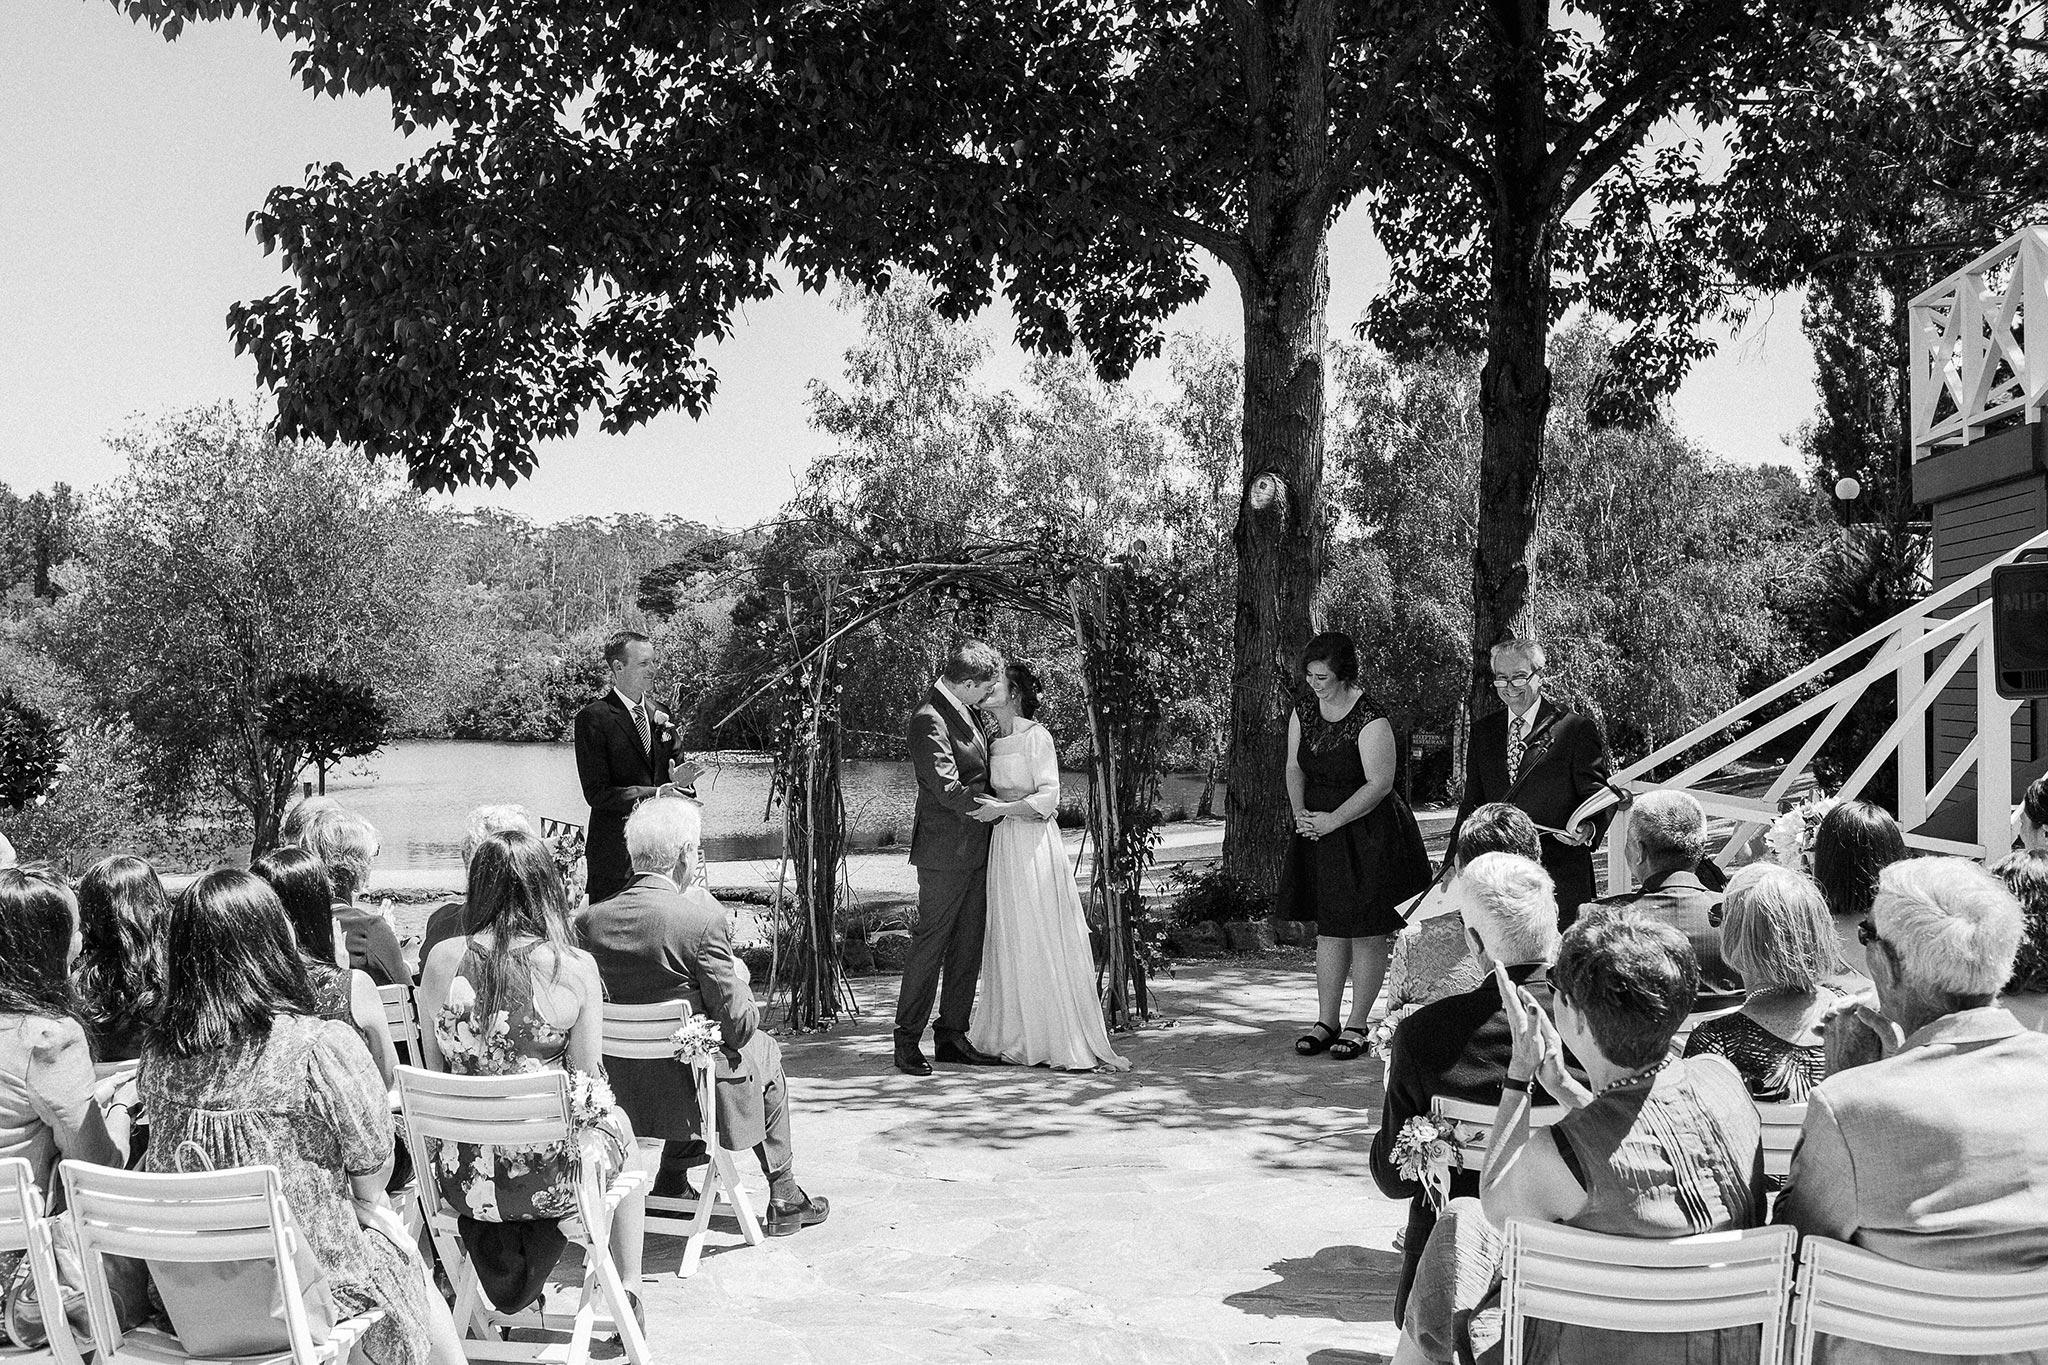 Daylesford-Lake-House-Wedding-Photography-ceremony-kiss